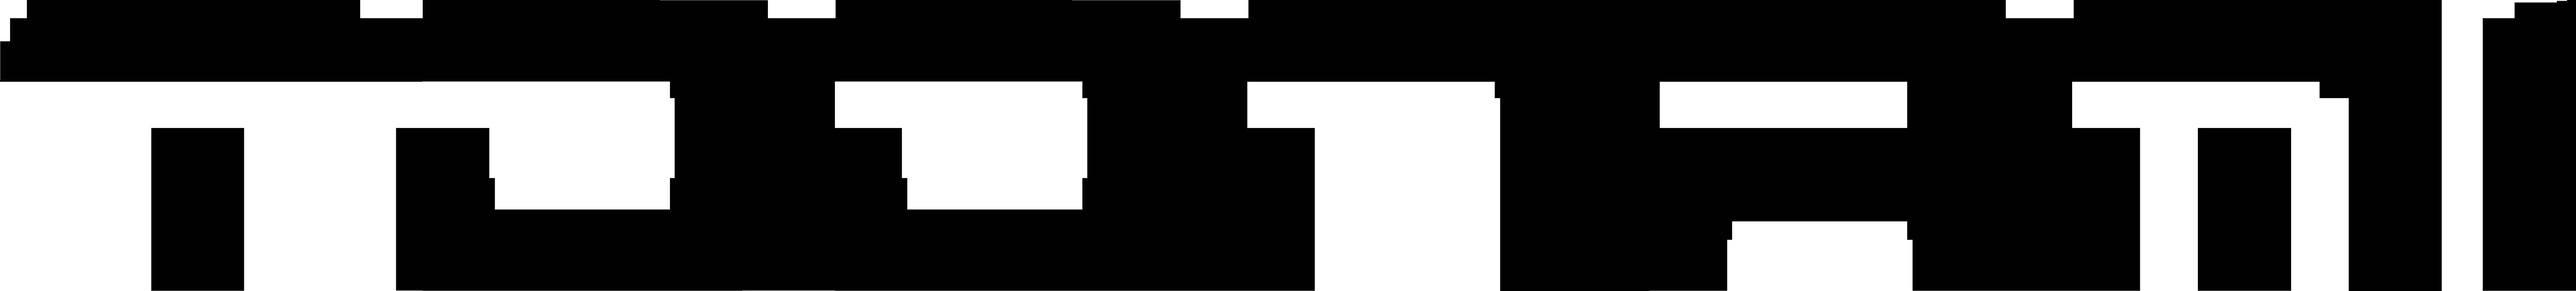 File:Toonami logo 2013.png.